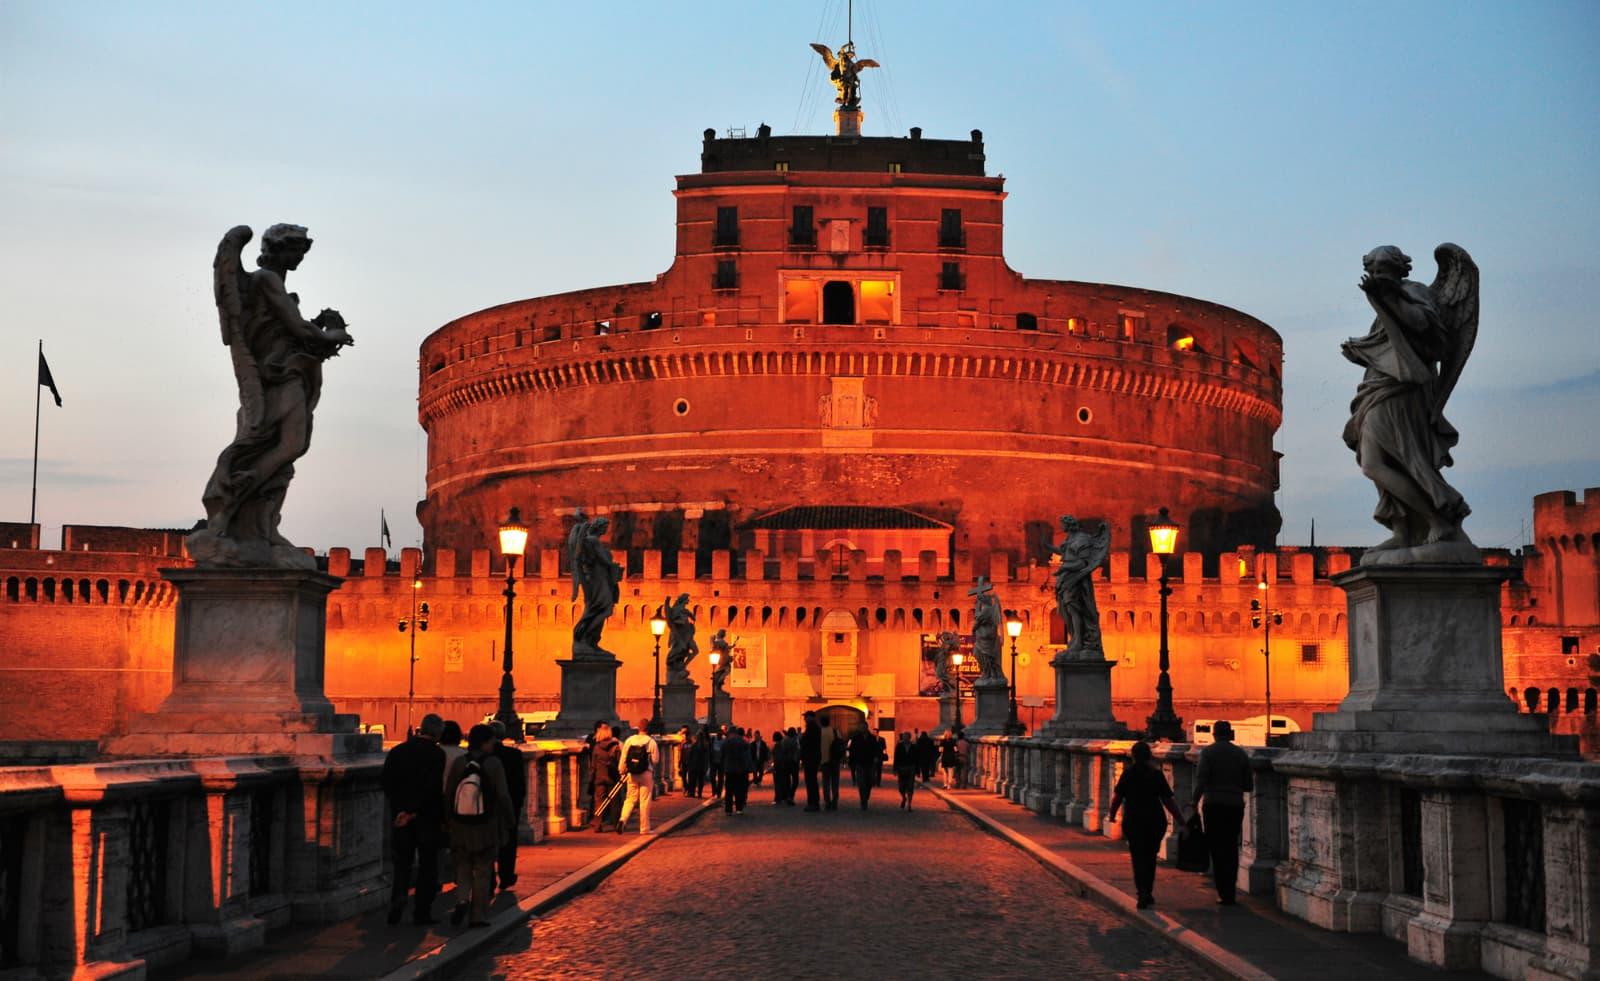 Angels & Demons of Rome: Revenge of the Illuminati image